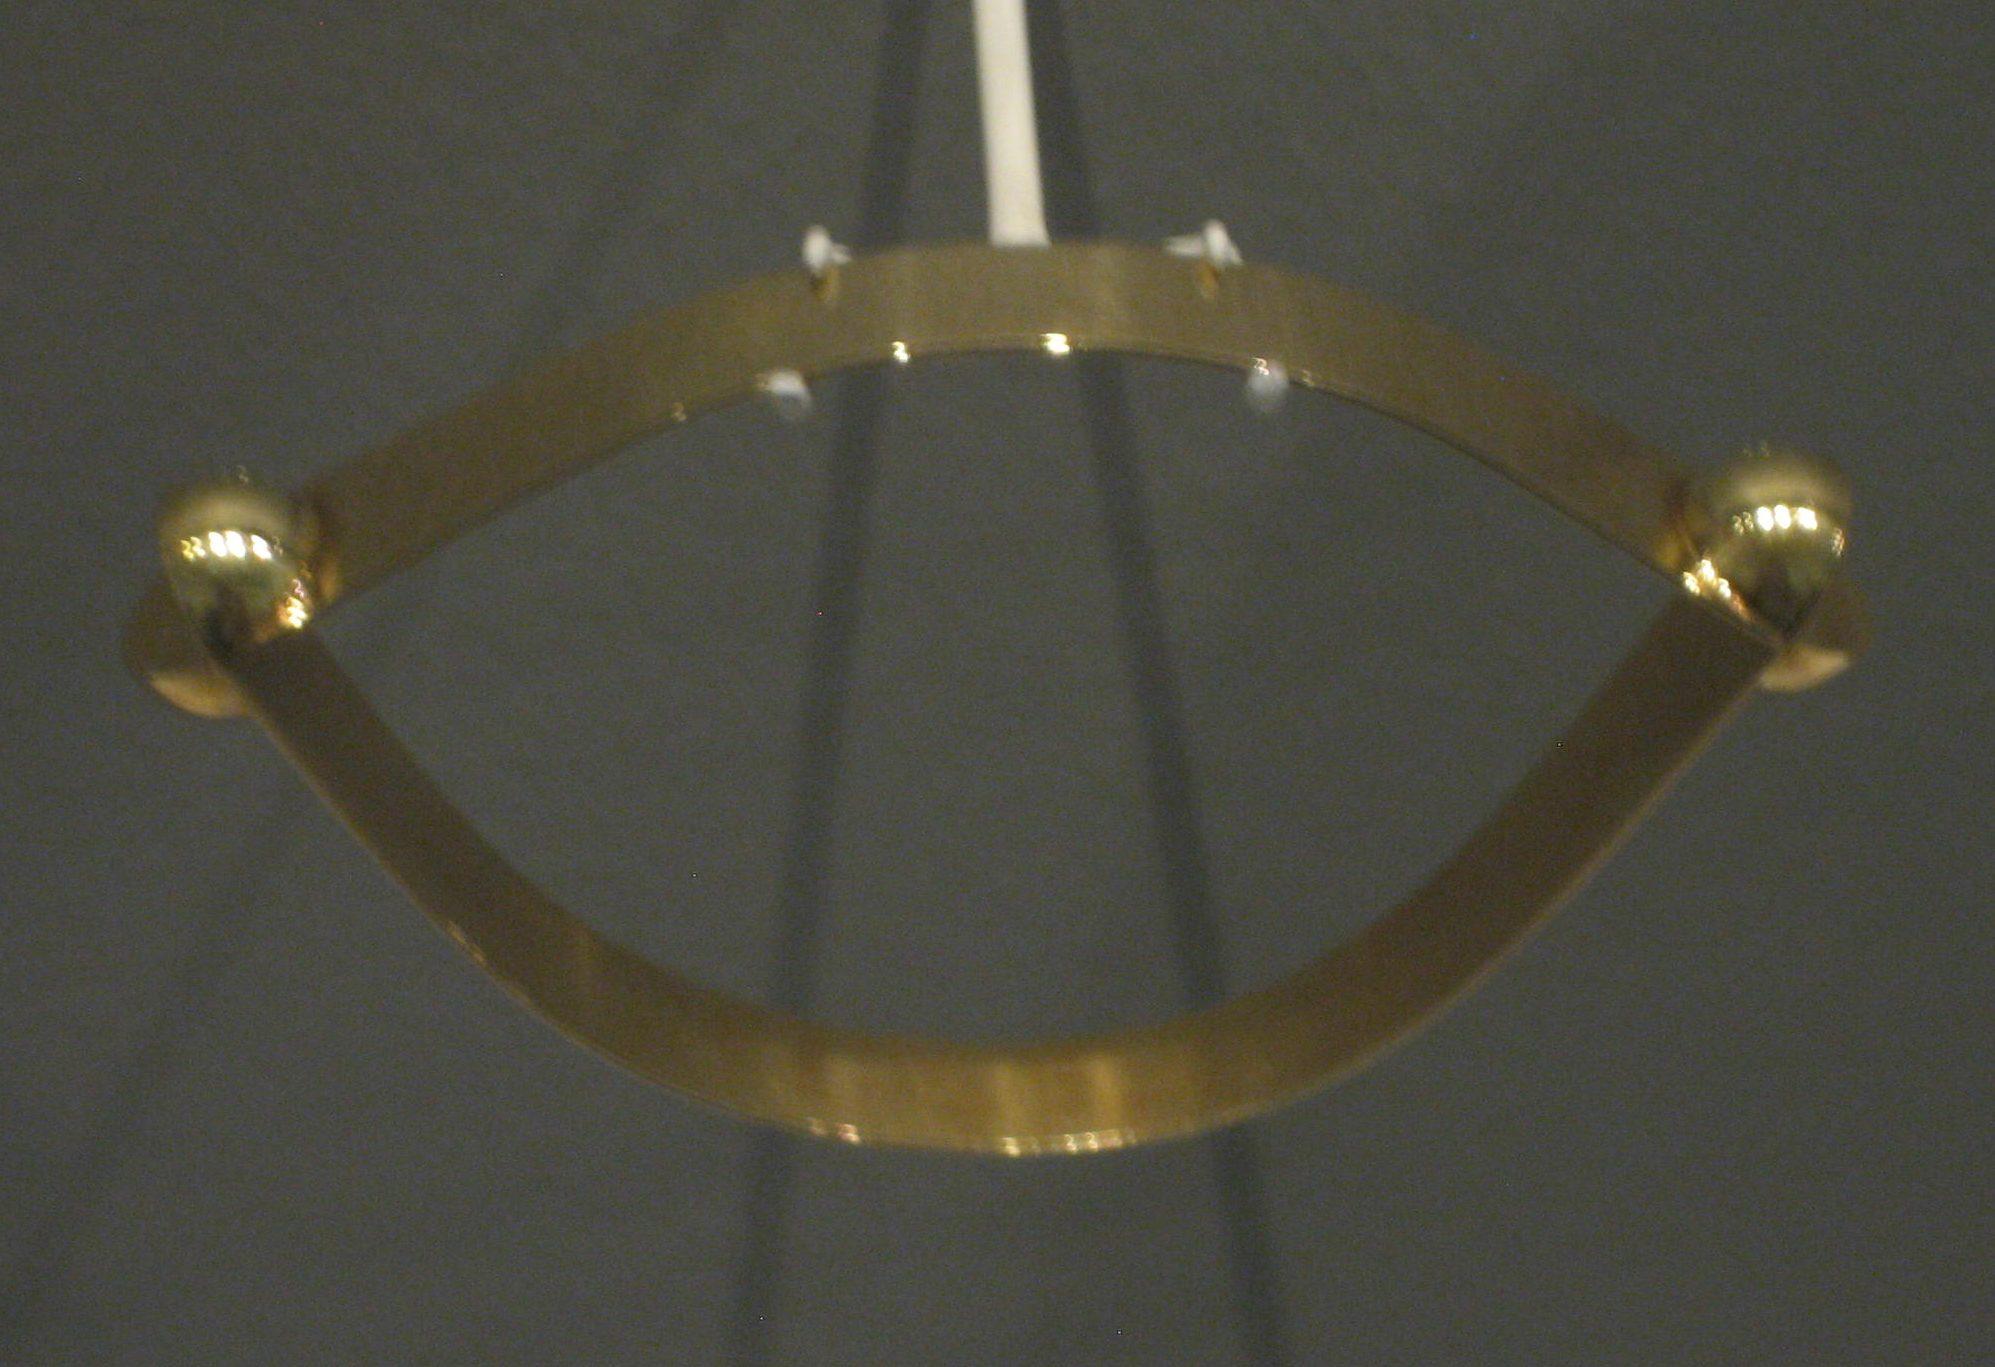 Riet Neerincx, Twee kwartbollen, armband, 1969. Museum Arnhem, koepelzaal, juli 2017, goud